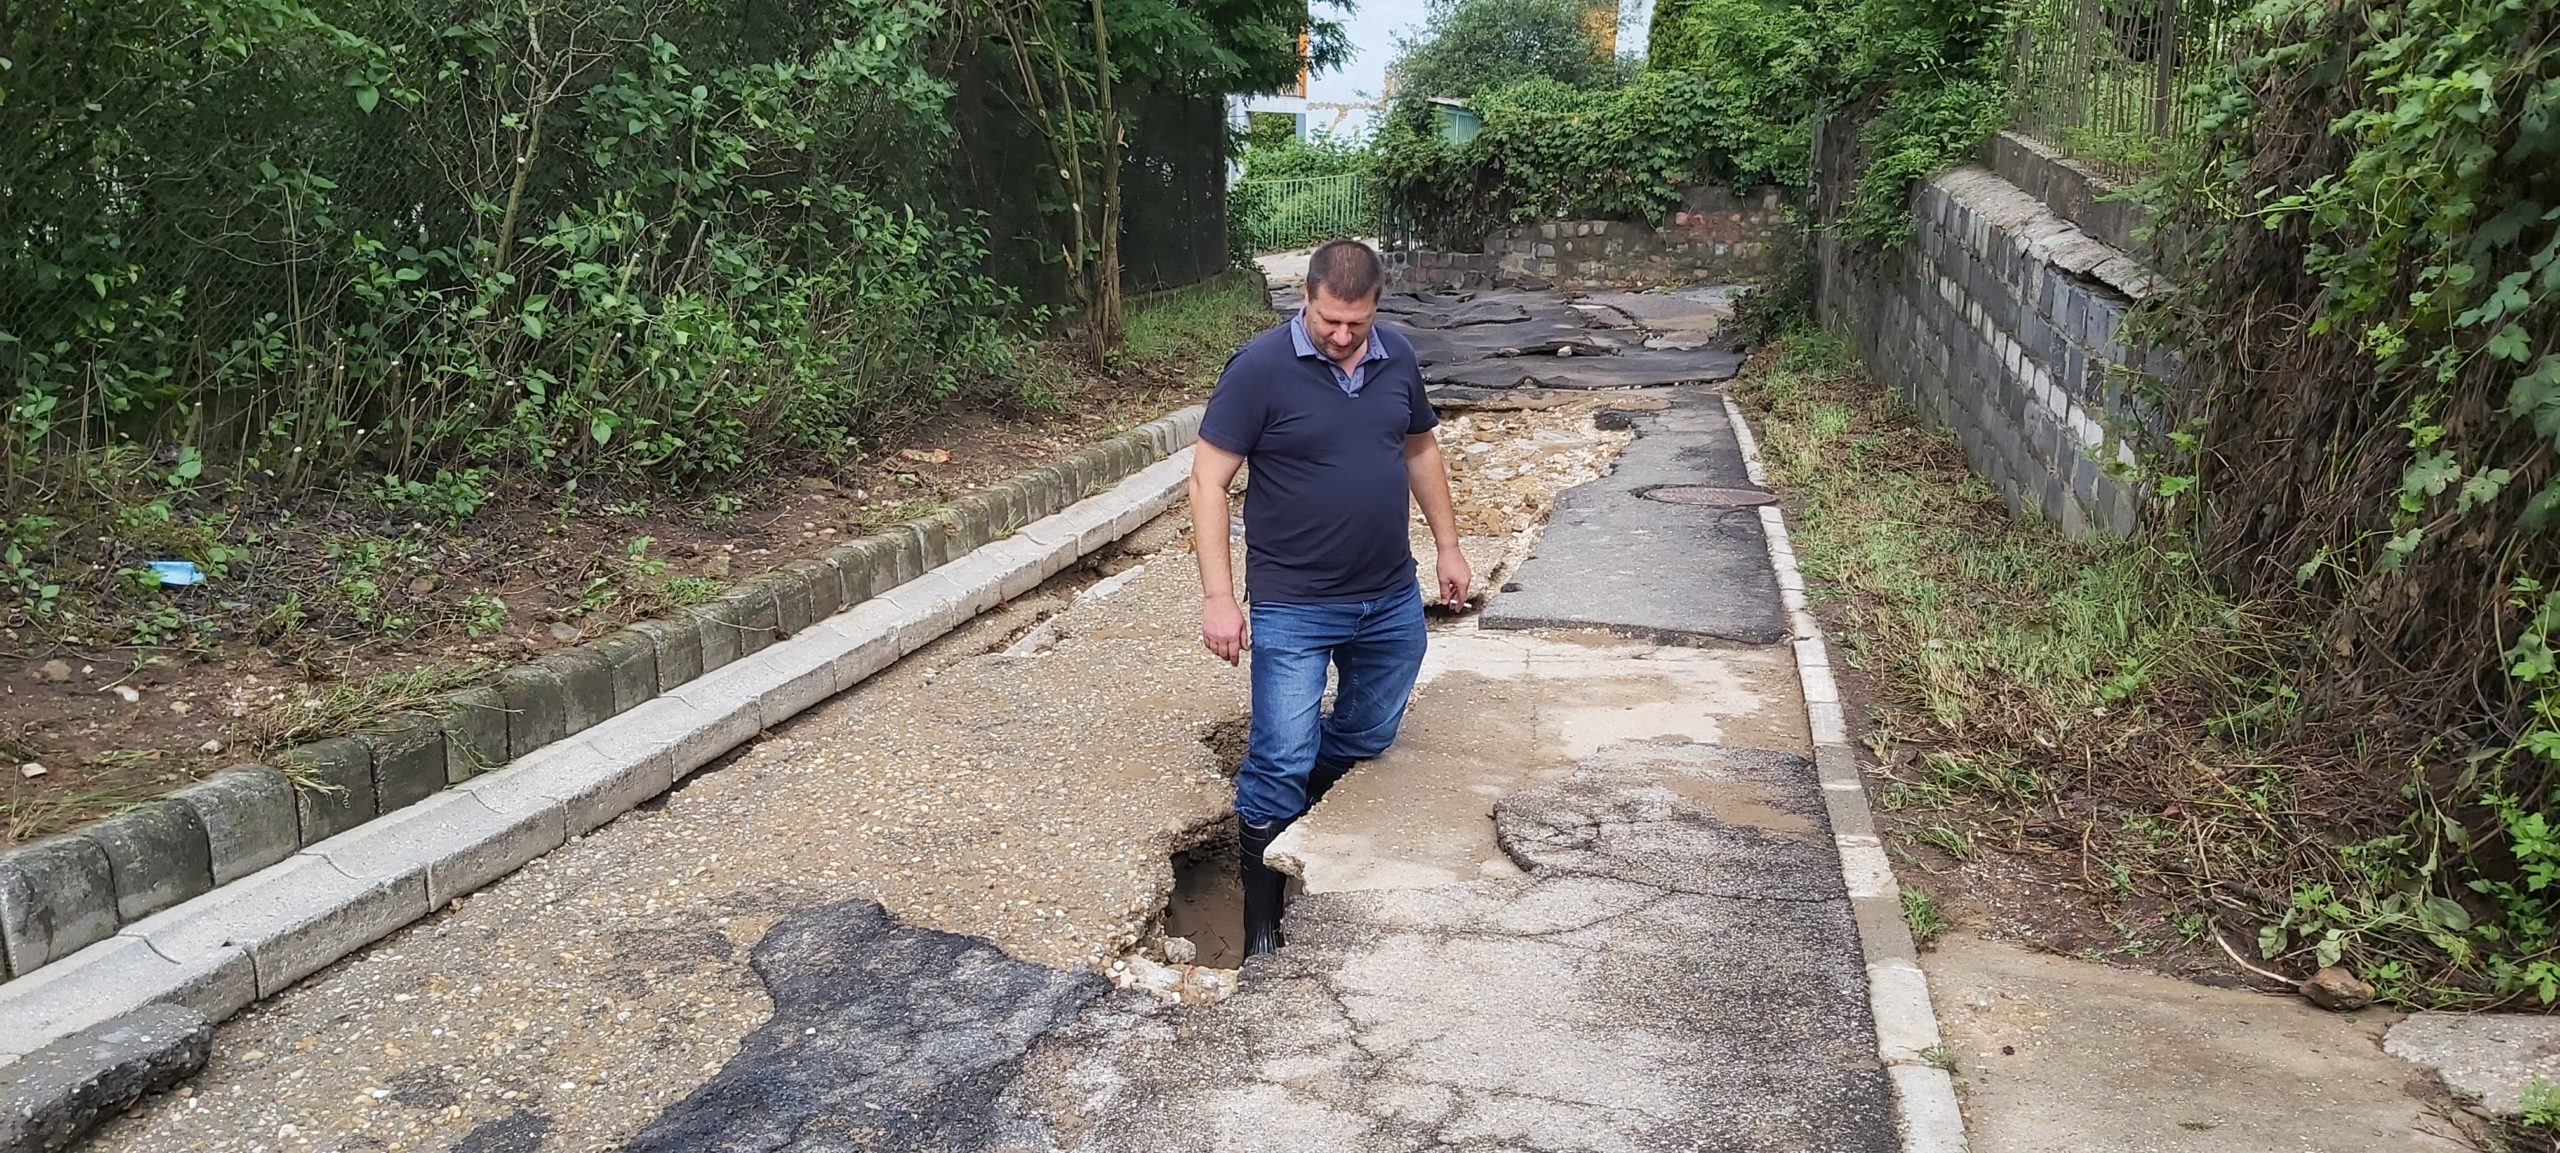 Komlós Tibor alpolgármester a Tücsök utcai bejáráson